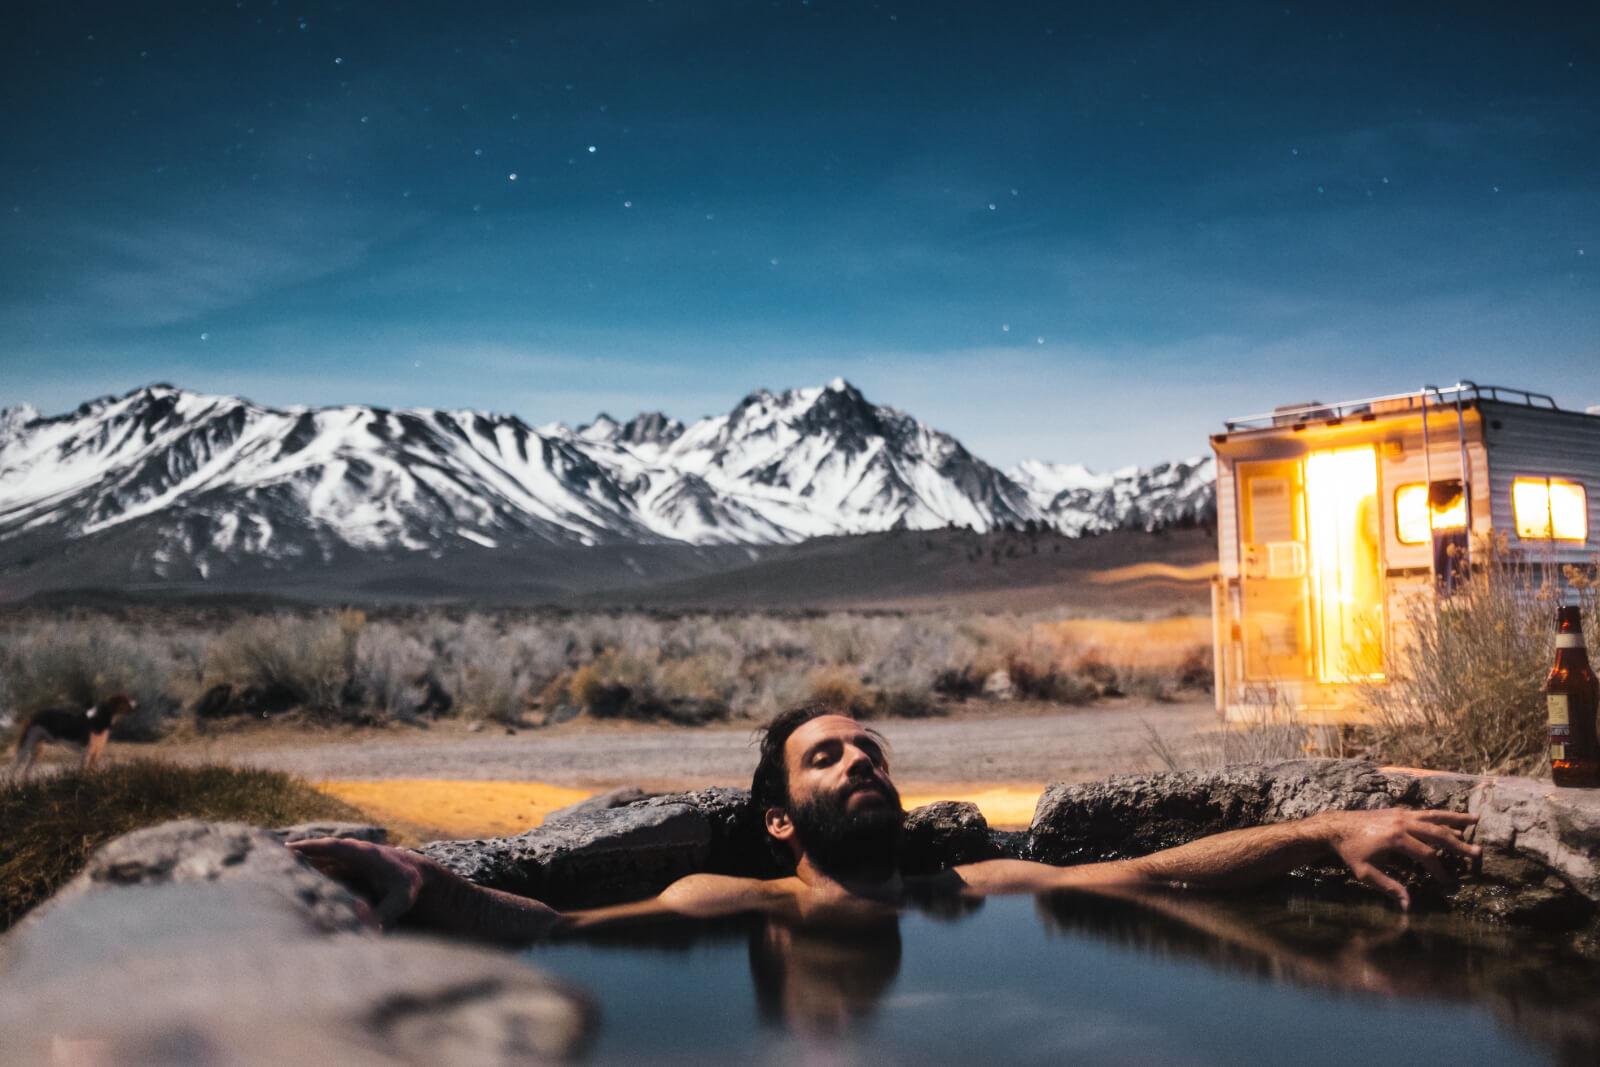 Dr.-Hauschka-Spruce-Warming-Bath-Essence-abloomnova.net_-1600x1067 The benefits of having a bath